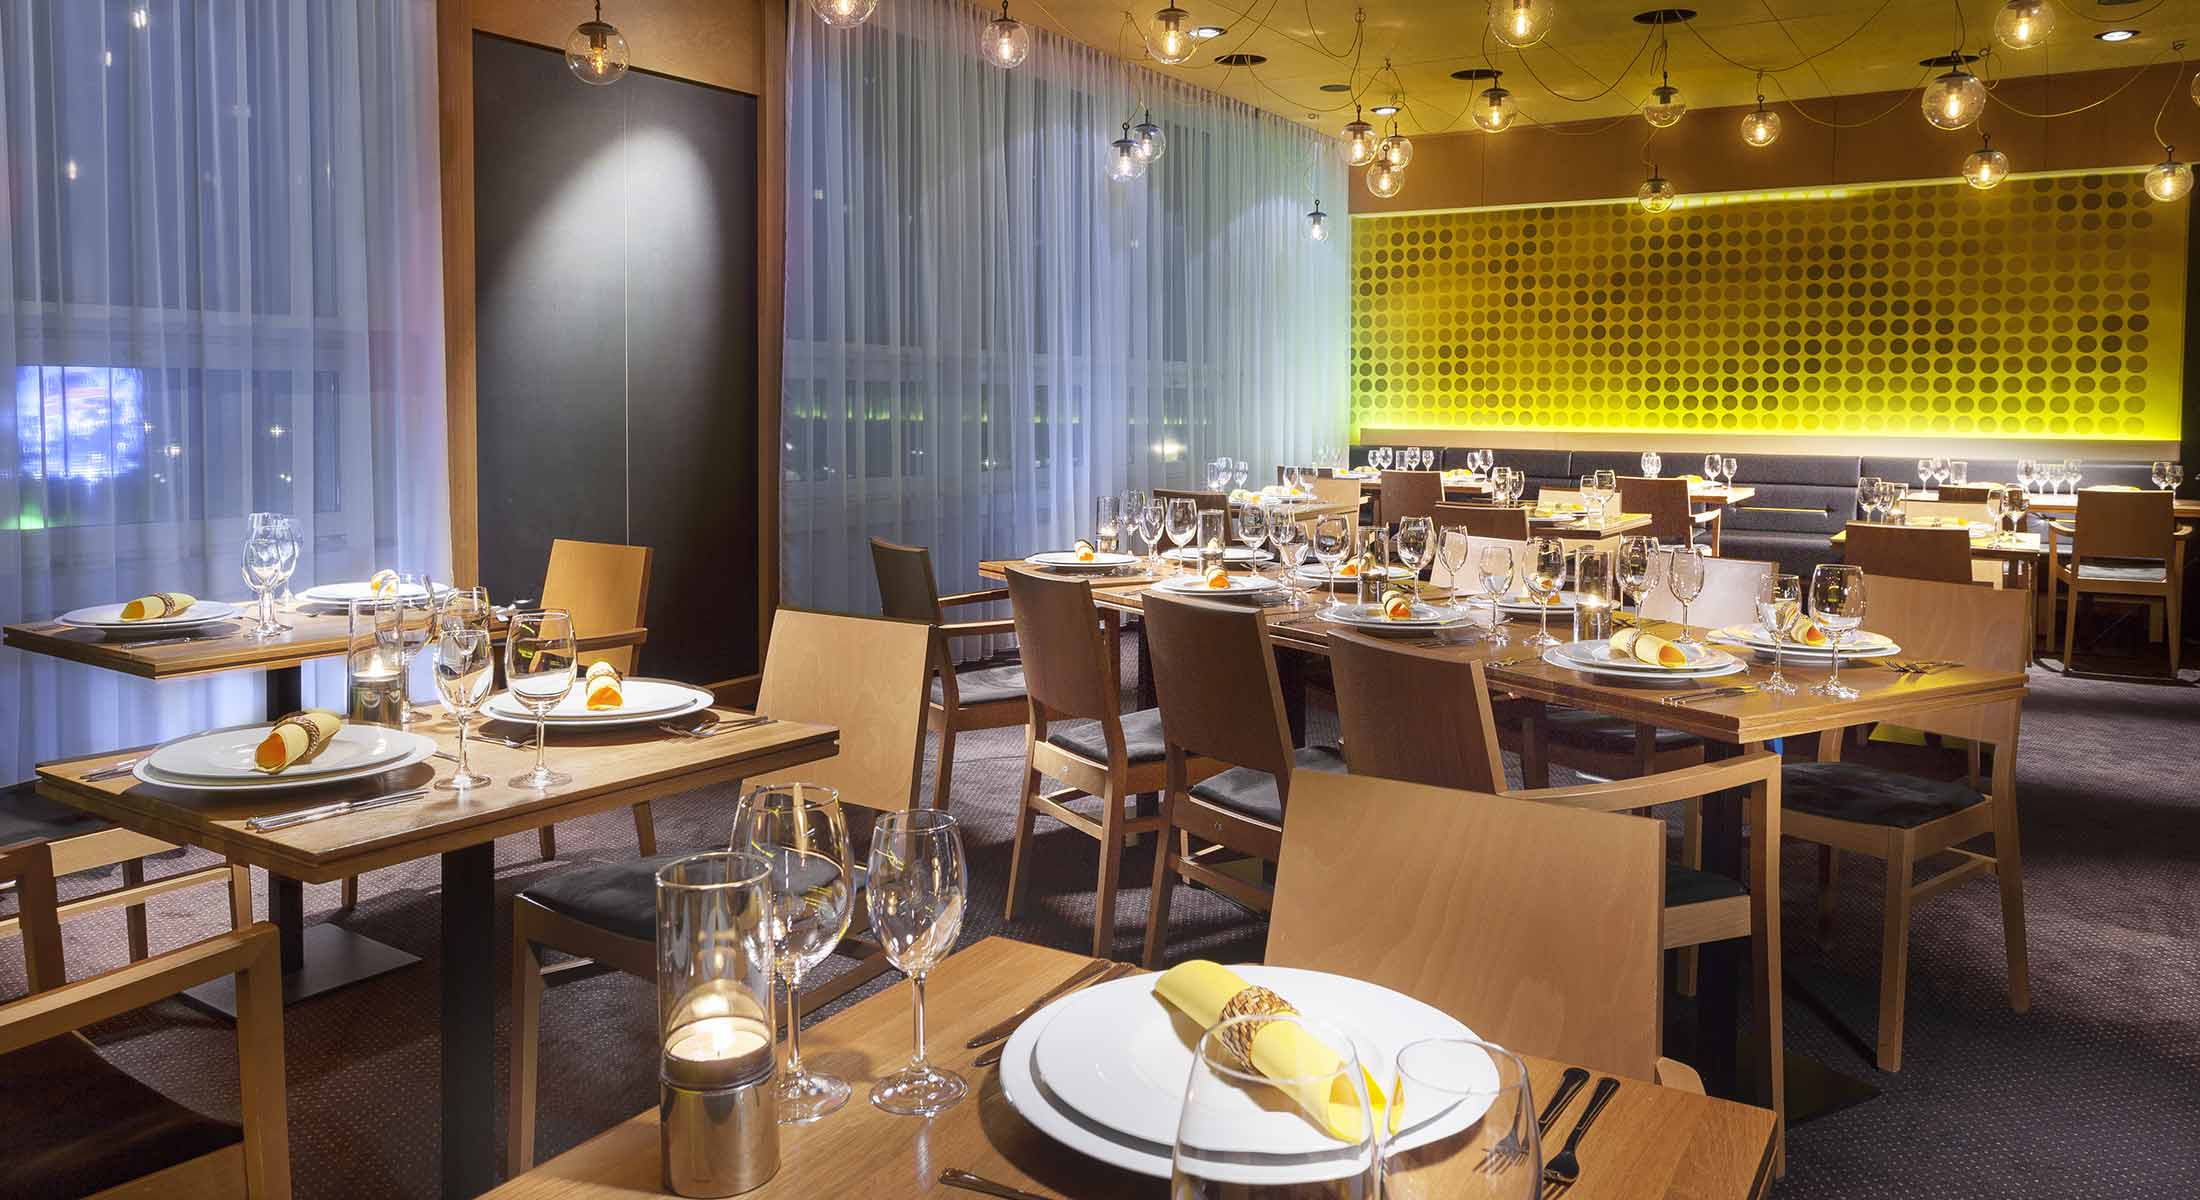 Ristorante - Ristorante 19 Hotel Praga - Hotel Golf Golf ...